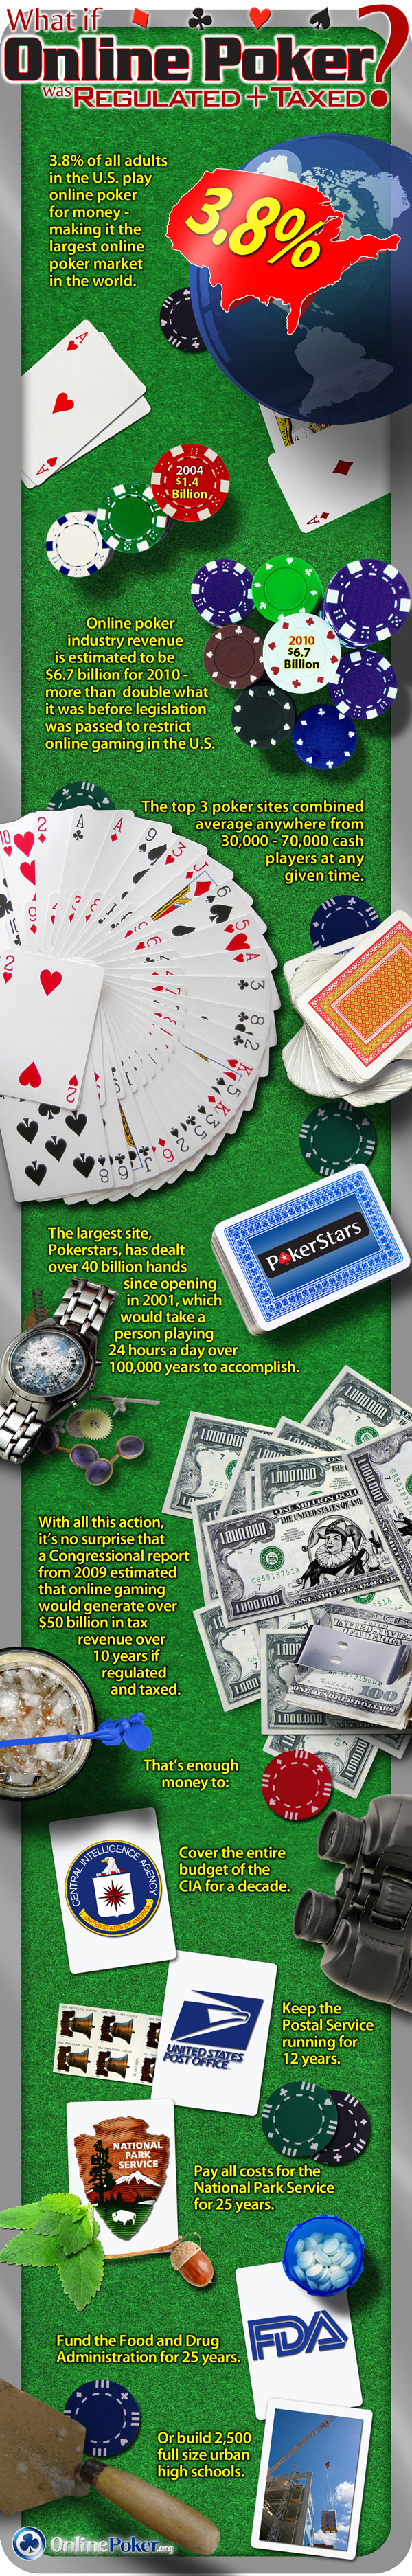 World's Largest Online Poker Market